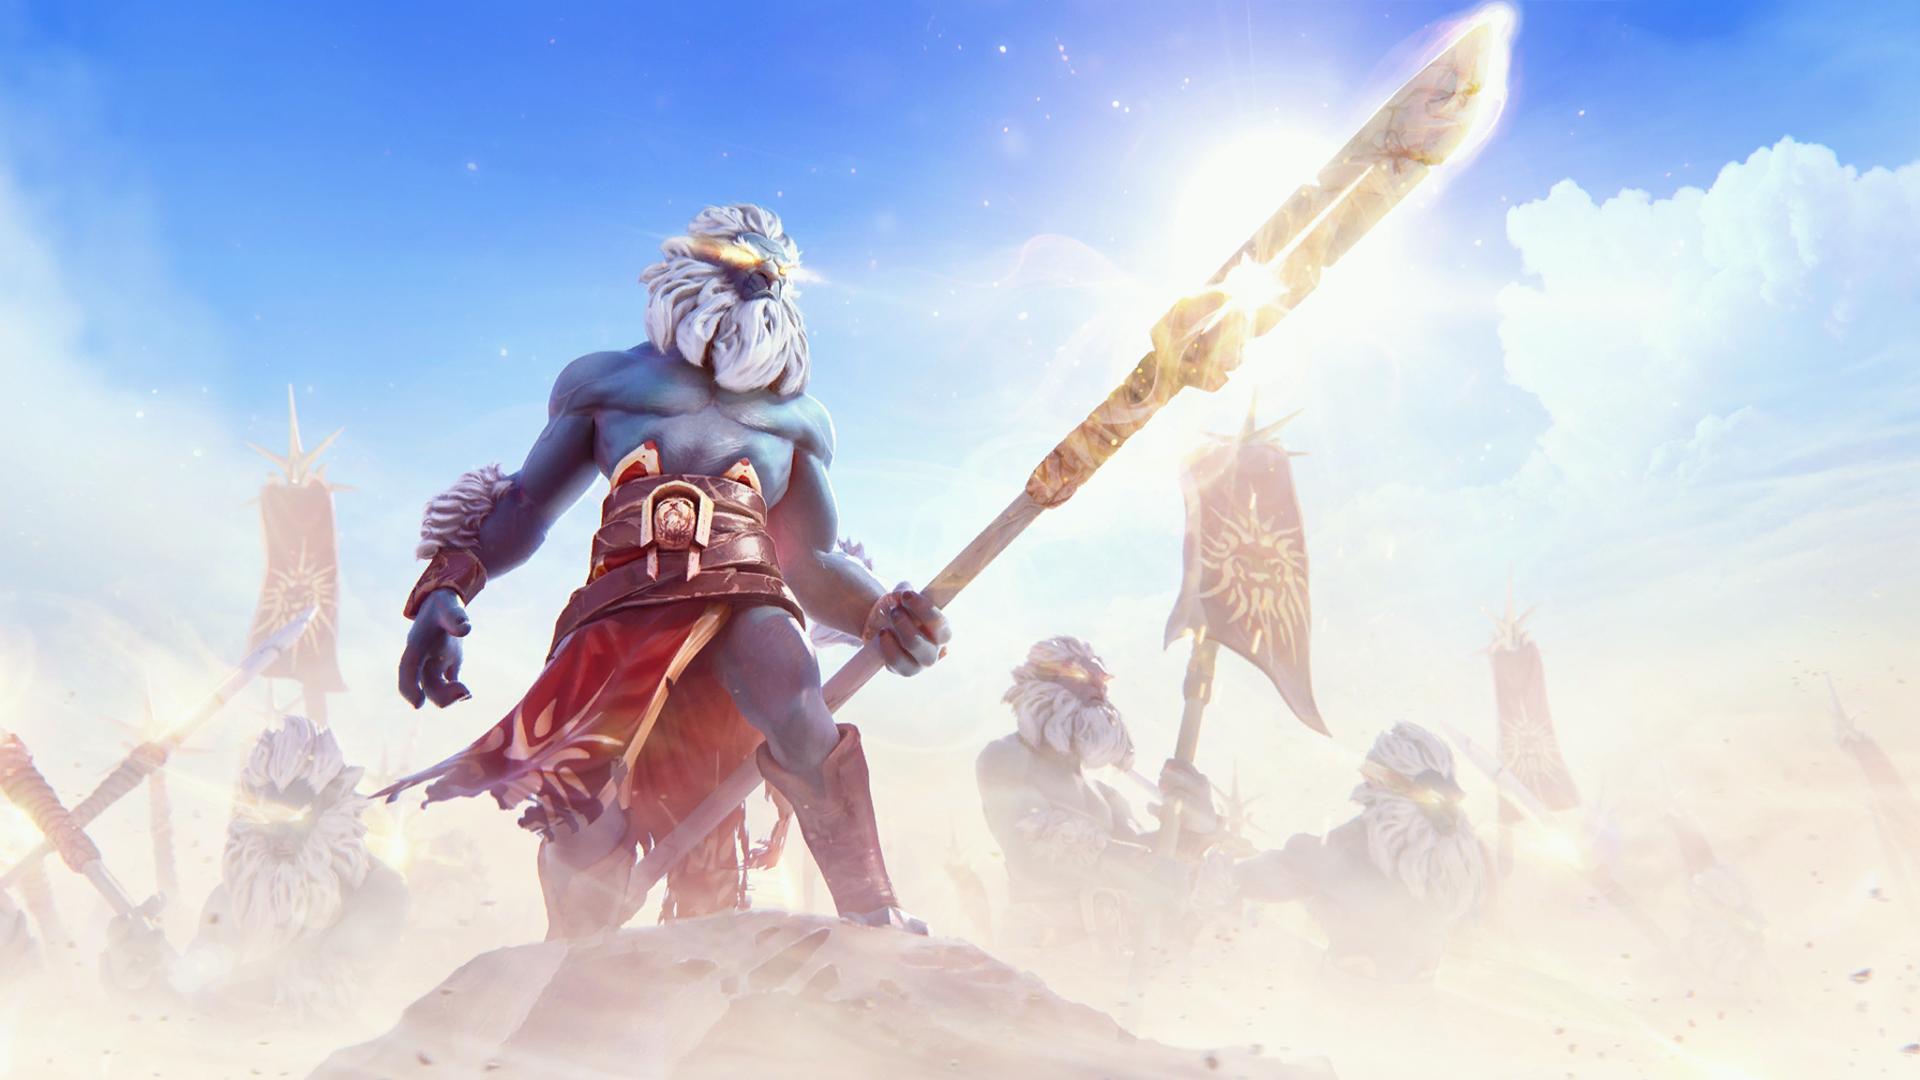 Video Games Hero Dota 2 Valve Corporation Defense Of The Ancient Phantom Lancer Screenshot